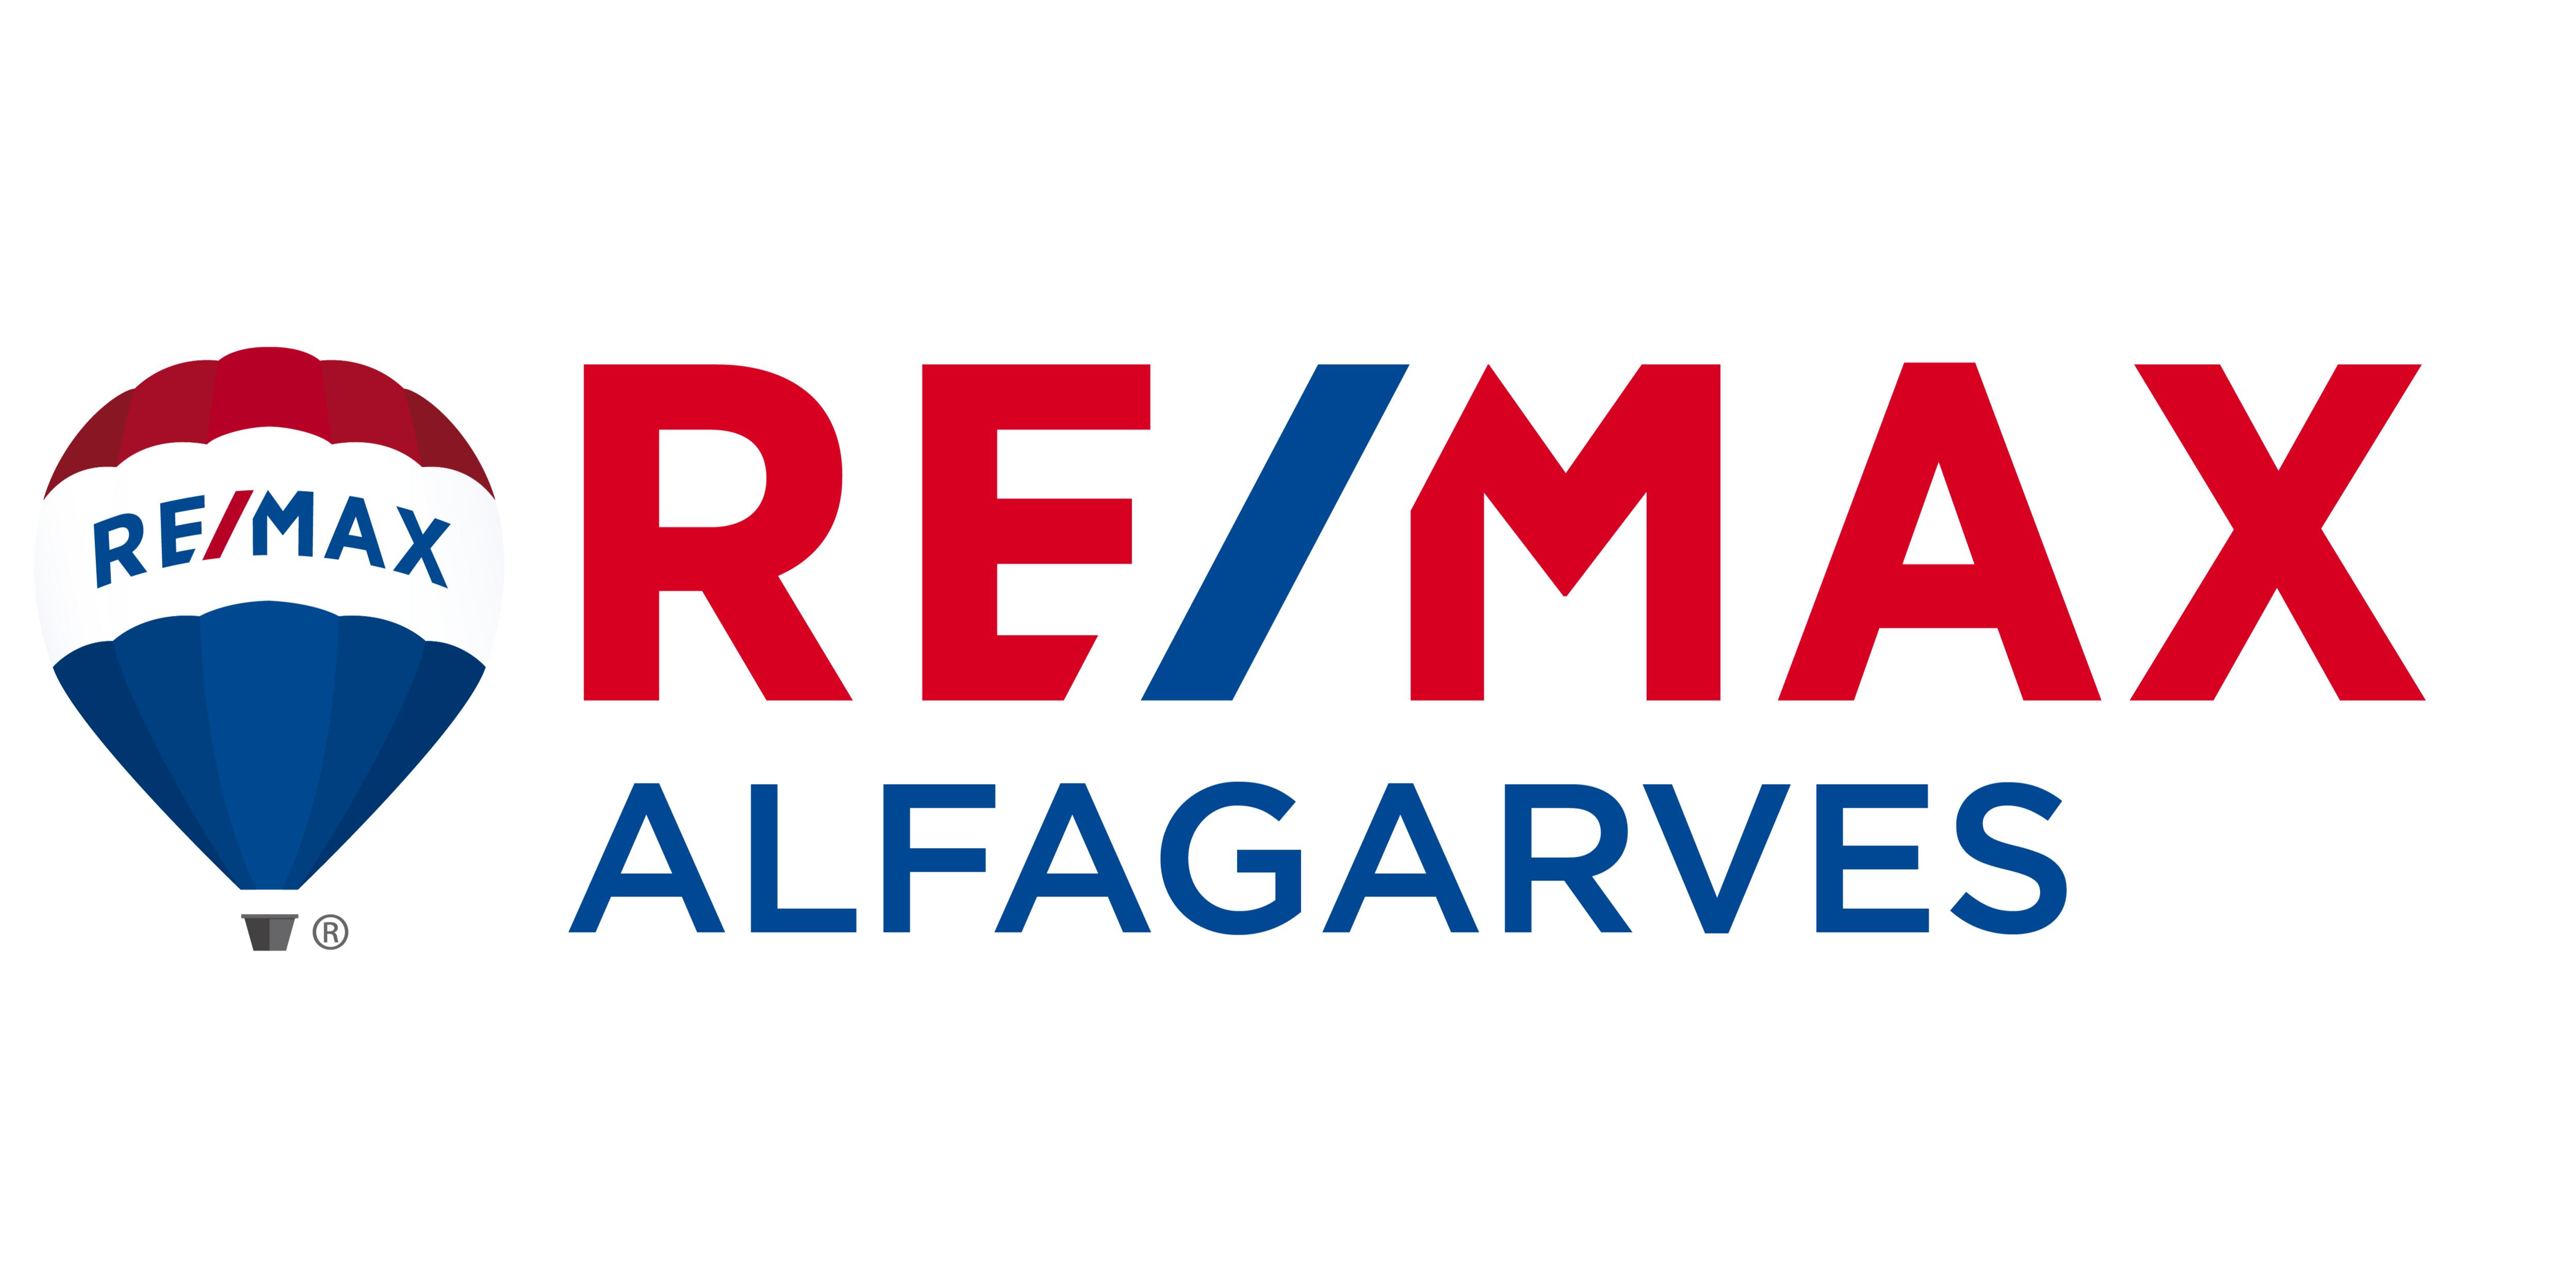 RE/MAX Alfagarves